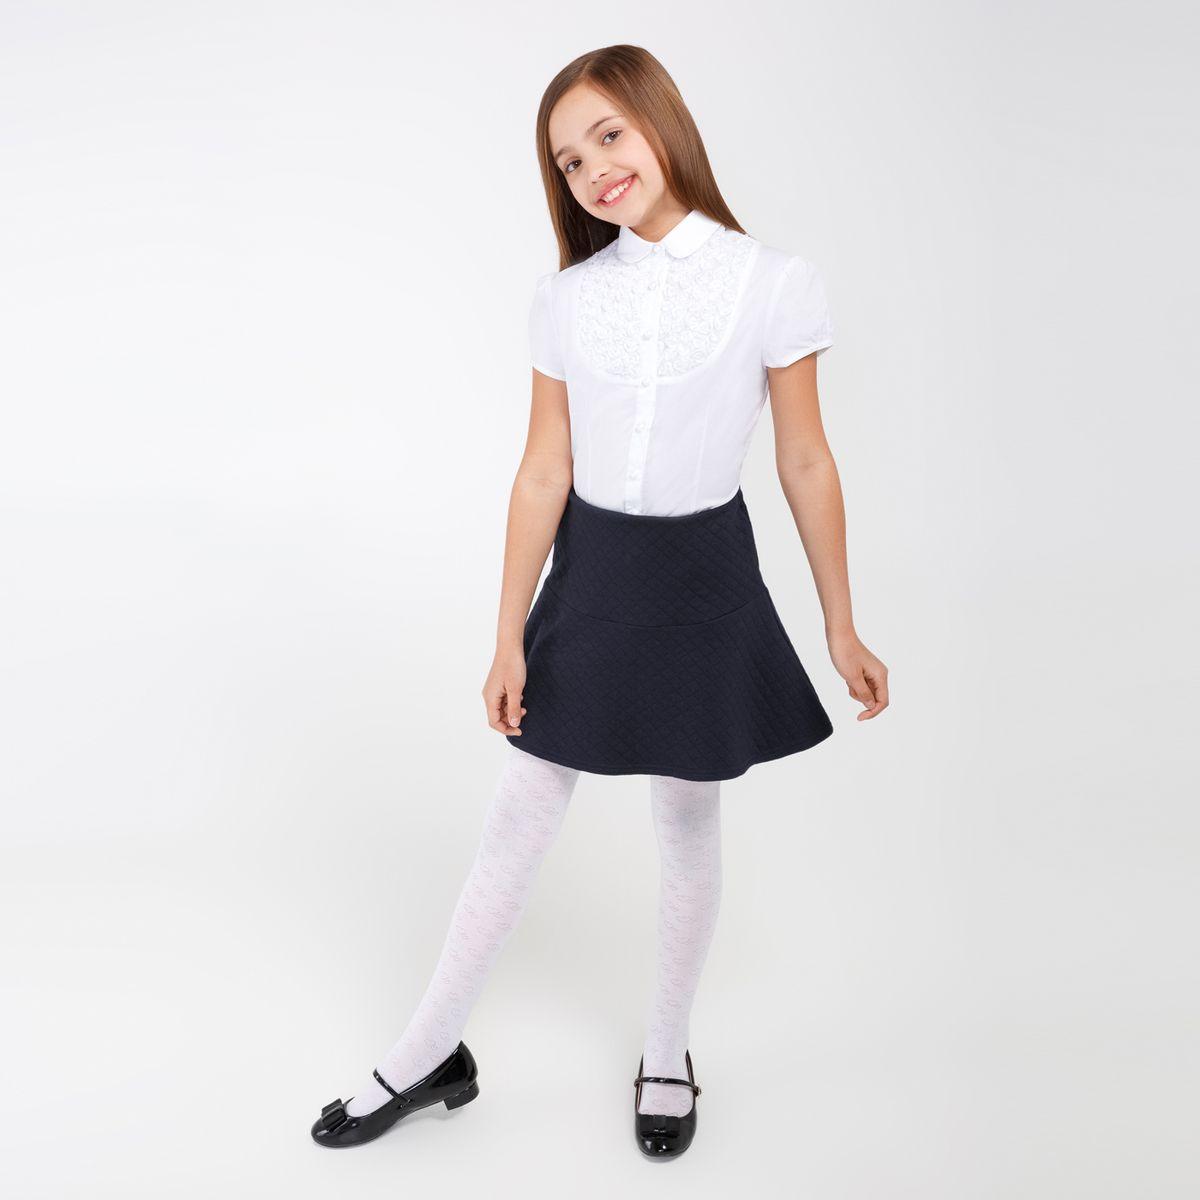 Юбка для девочки Moss. 2024018000920240180009_600